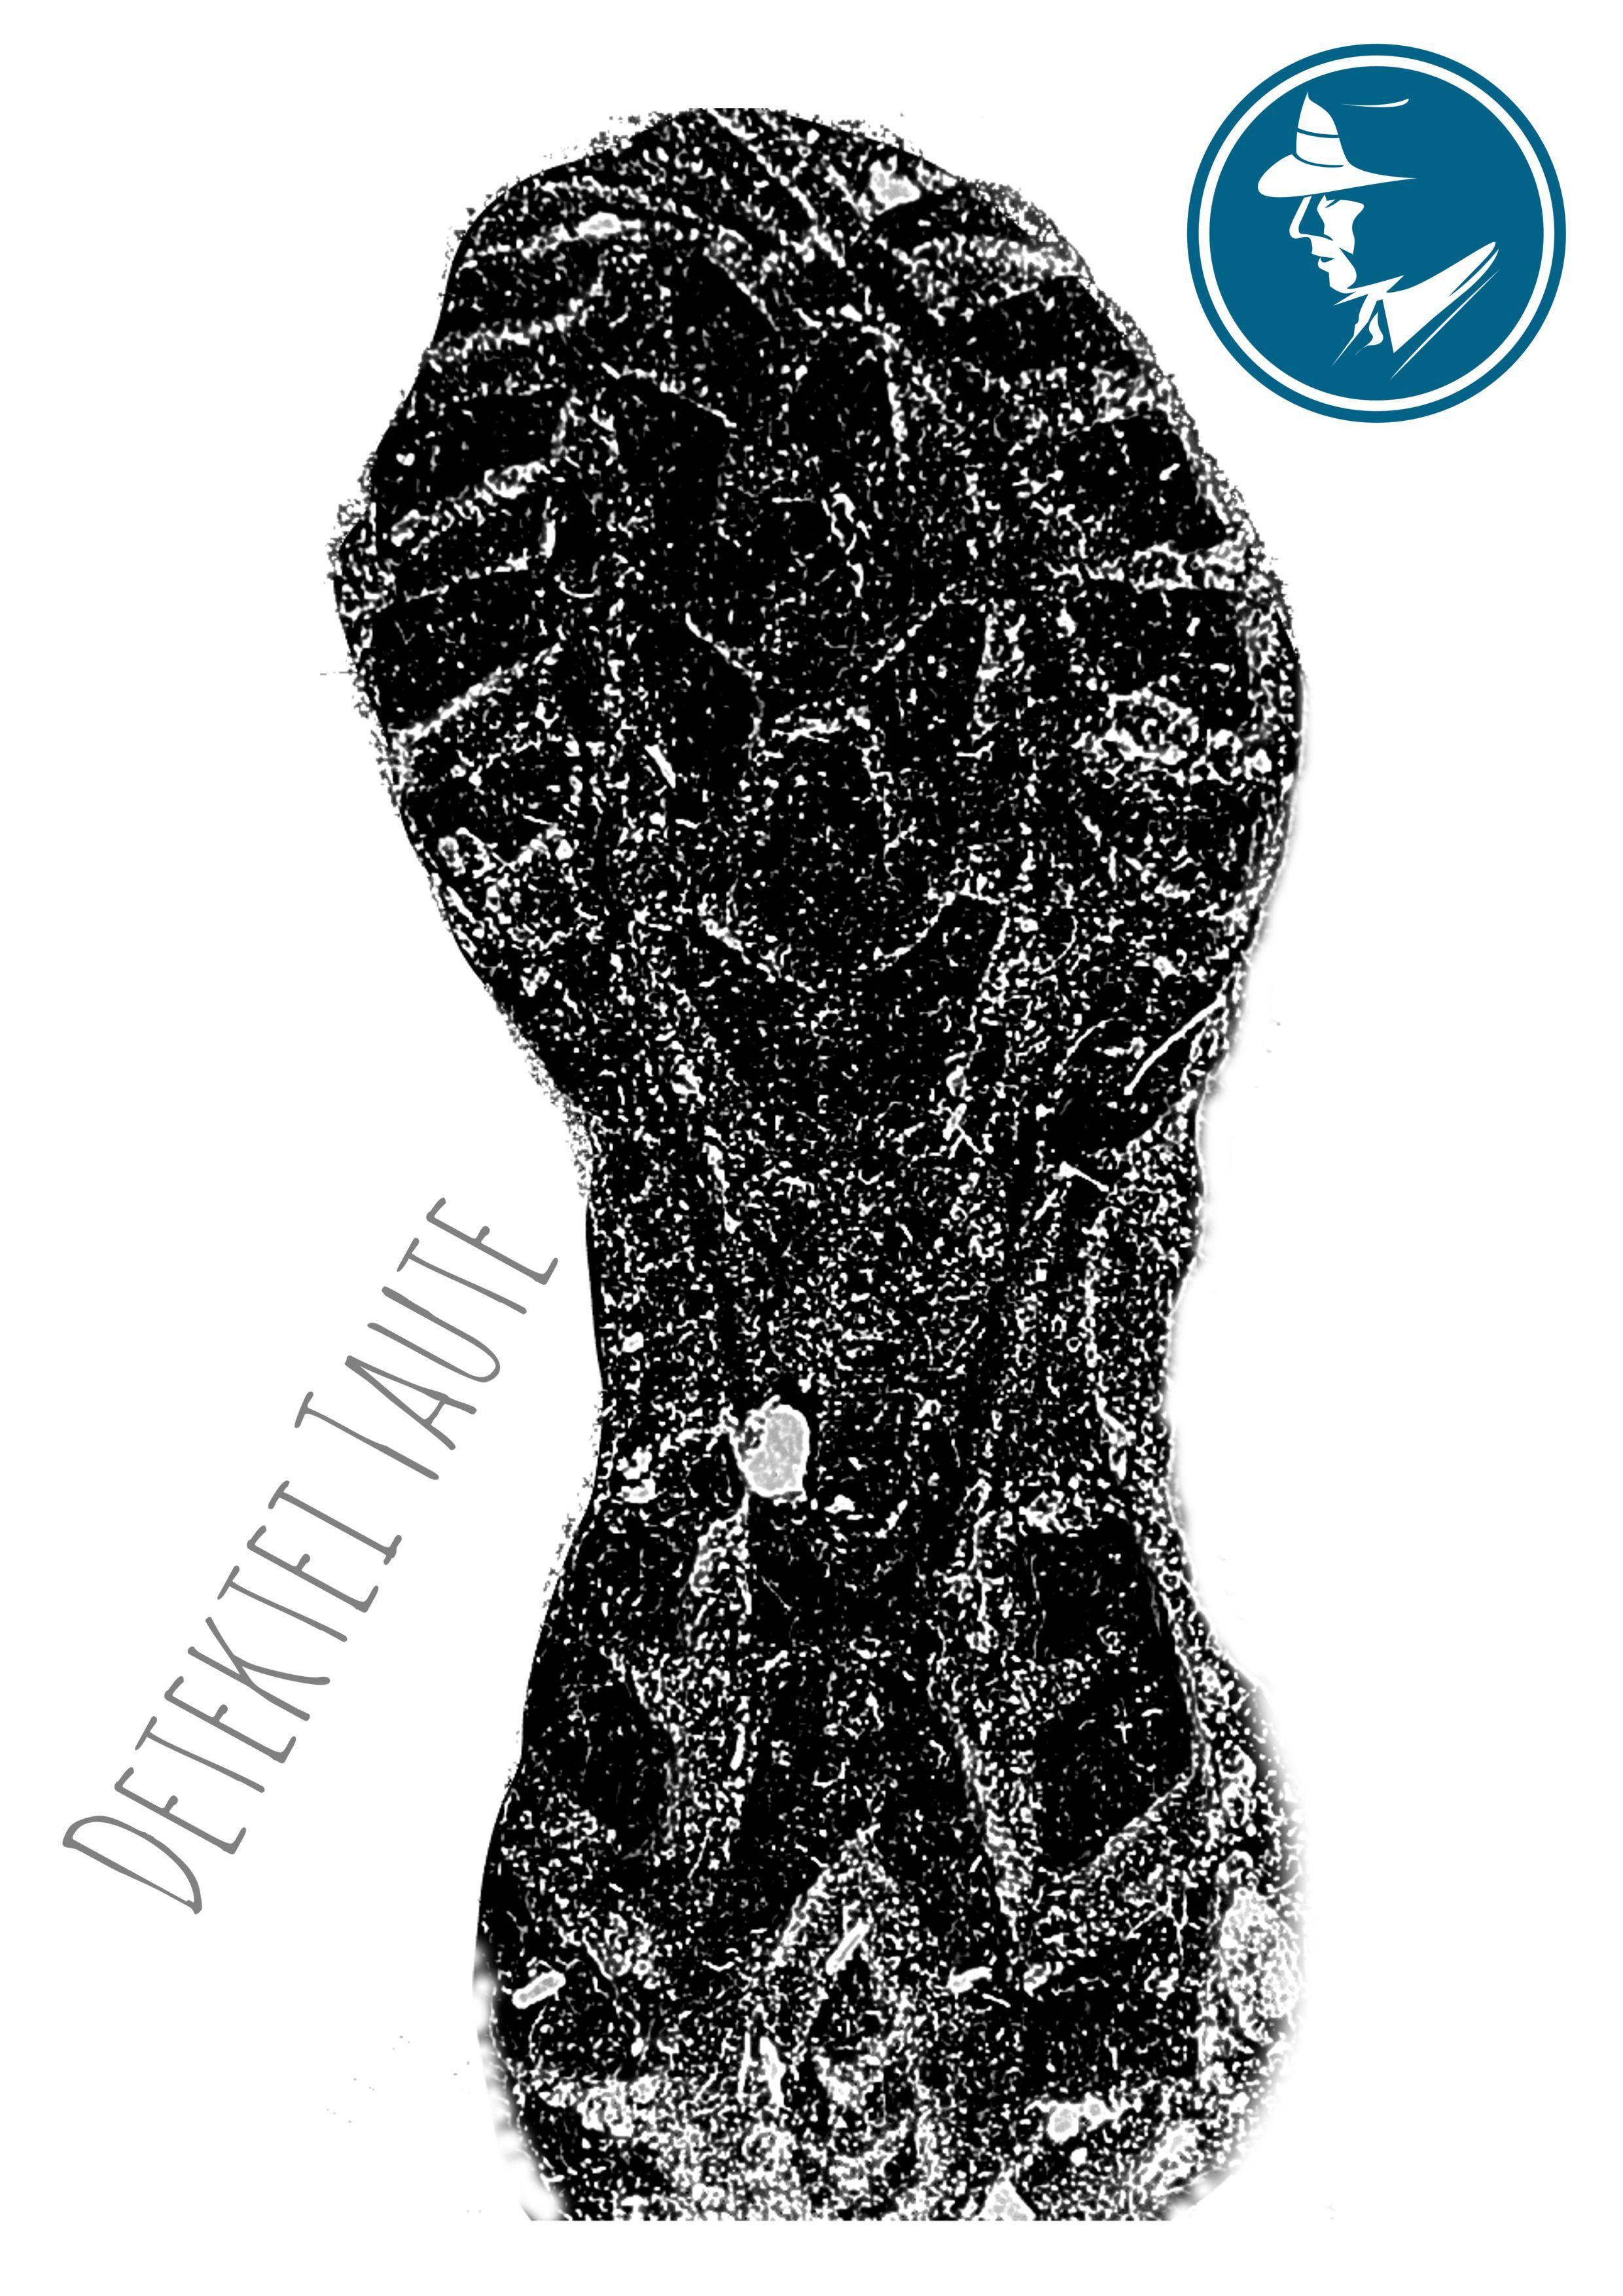 Schuhabdruck Fussabdruck Vorlage In Schwarz Schuhabdruck Spuren Fussabdruck Ausdrucken Detekteitaut Geburtstagsideen Geburtstags Feier Kinder Geburtstag